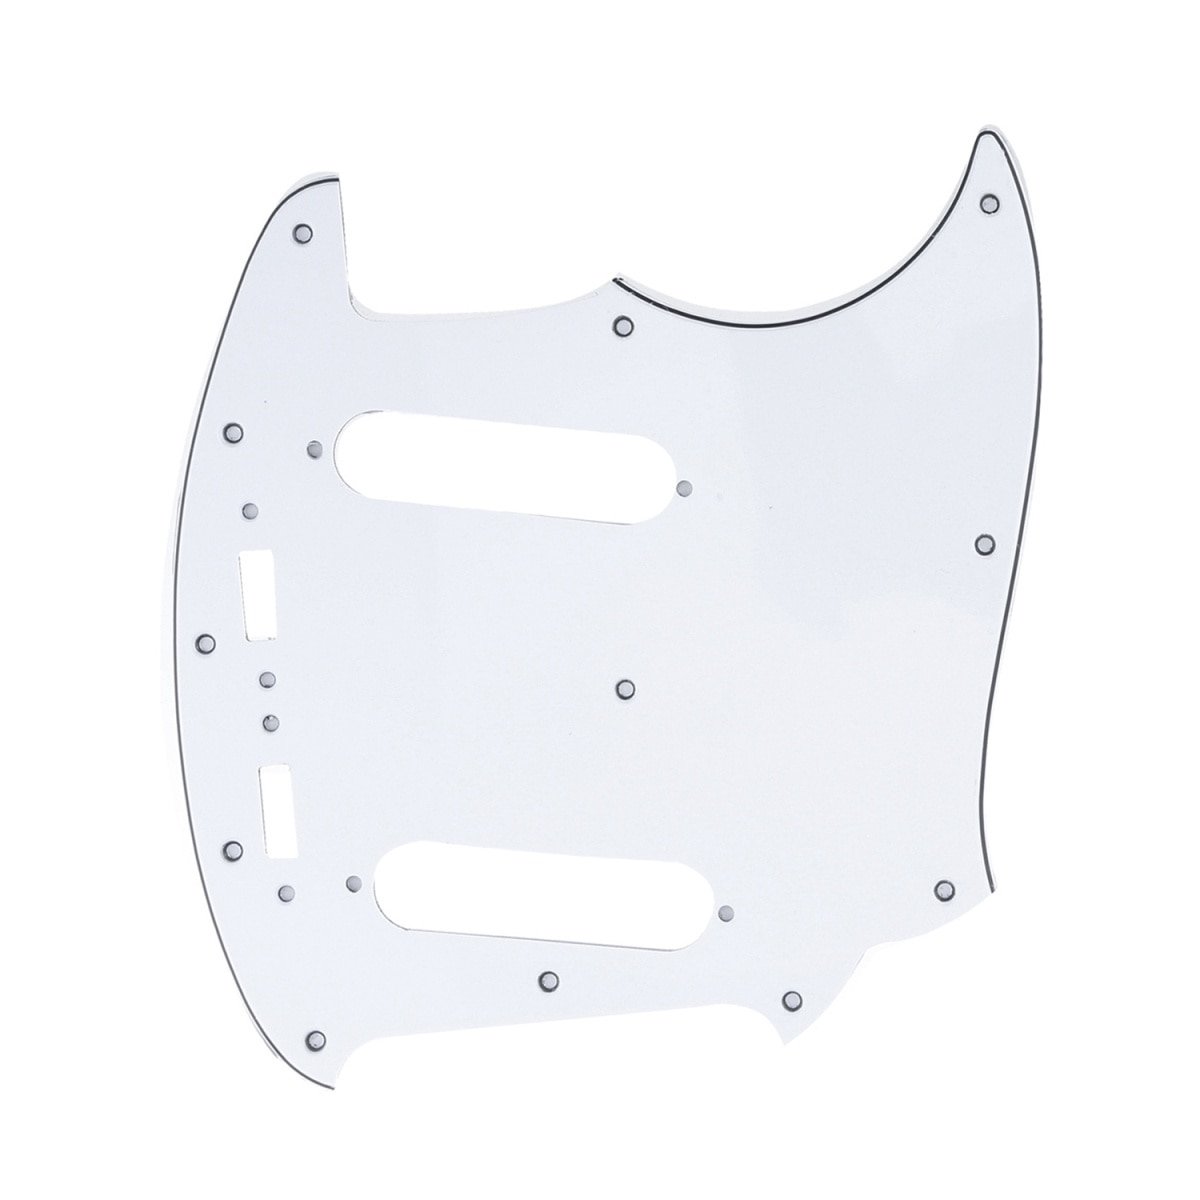 Golpeador de guitarra de 12 orificios Musiclily Pro para JPN Fender Japan Mustang, color blanco de 3 capas